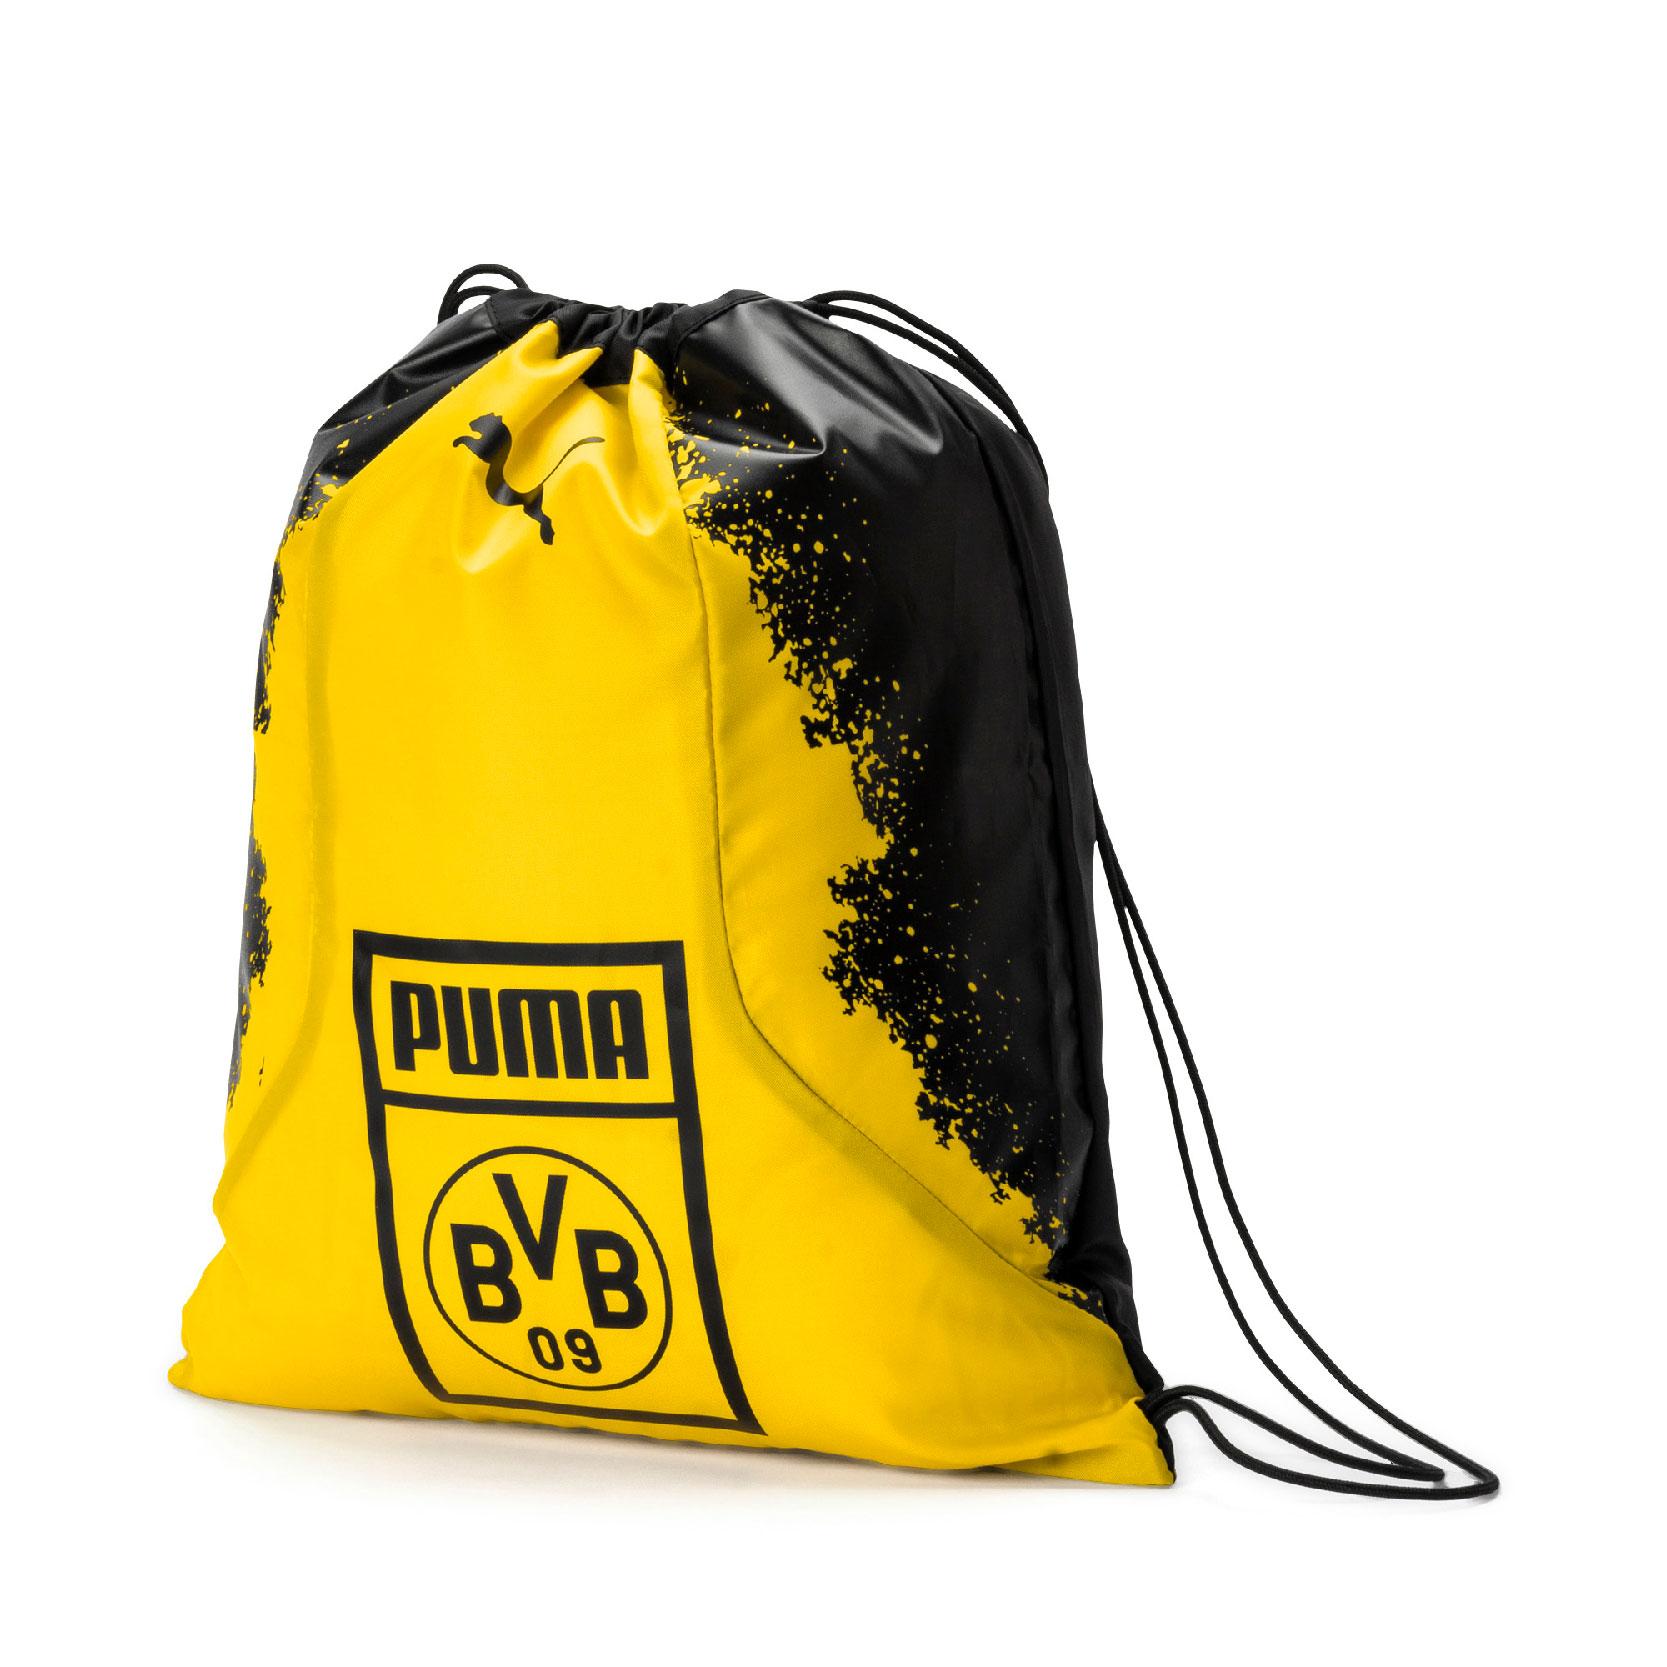 Puma BVB Borussia Dortmund Turnbeutel BVB Fan Gym Sack 075568-01